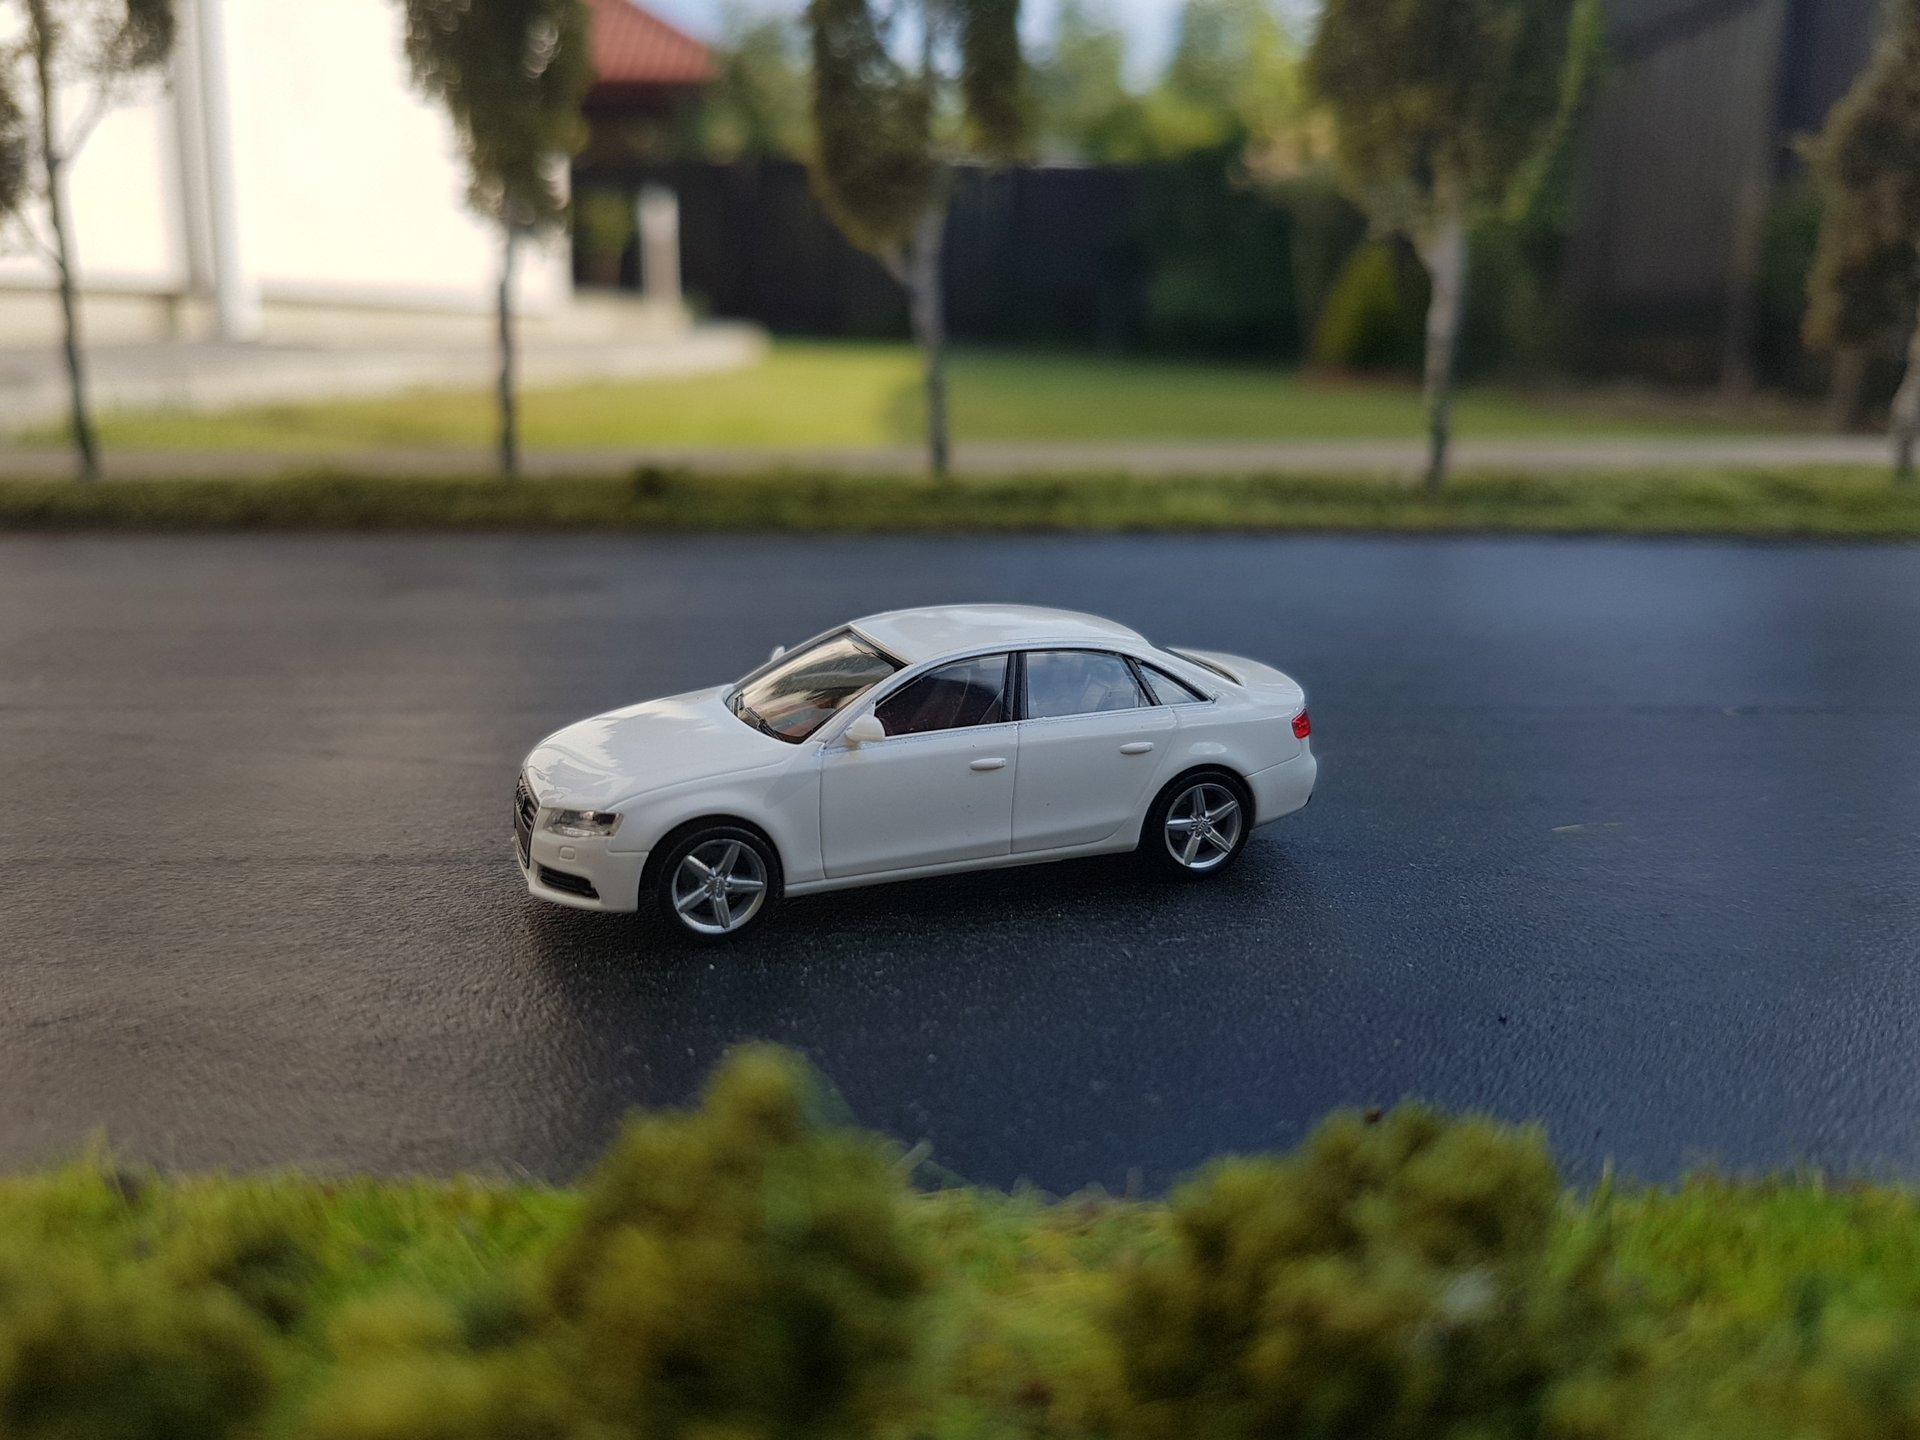 Audi A4 01.jpg